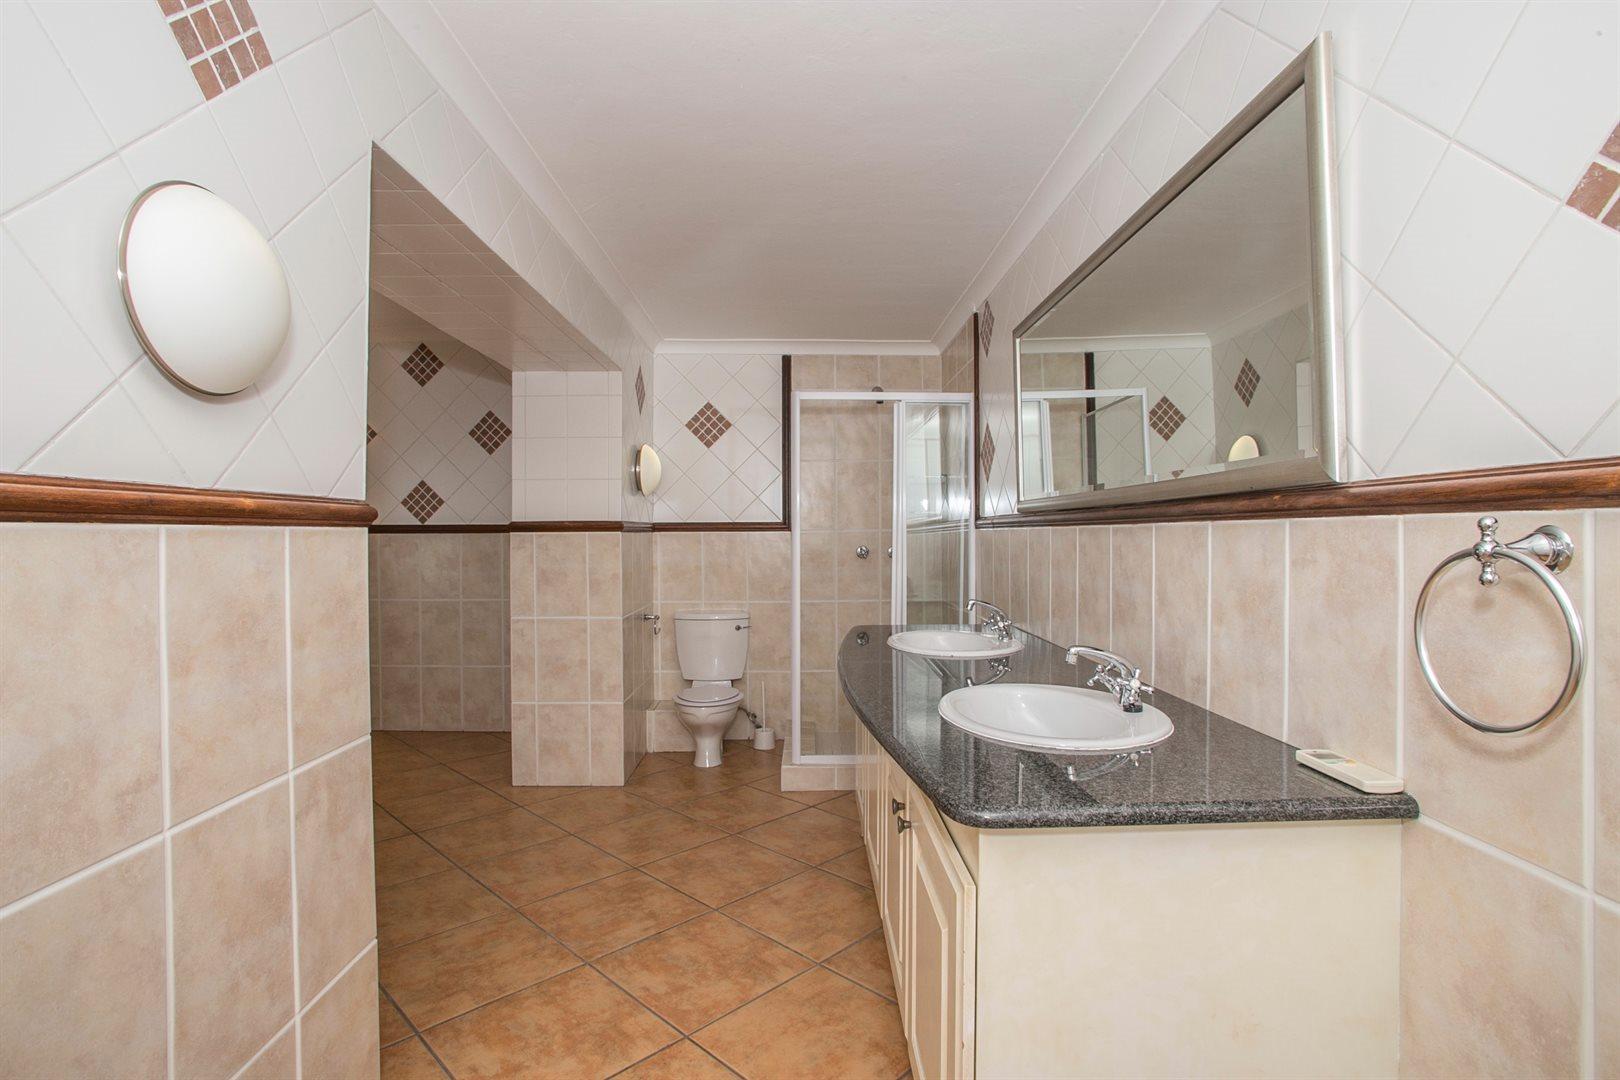 Dainfern Golf Estate property for sale. Ref No: 13381182. Picture no 9